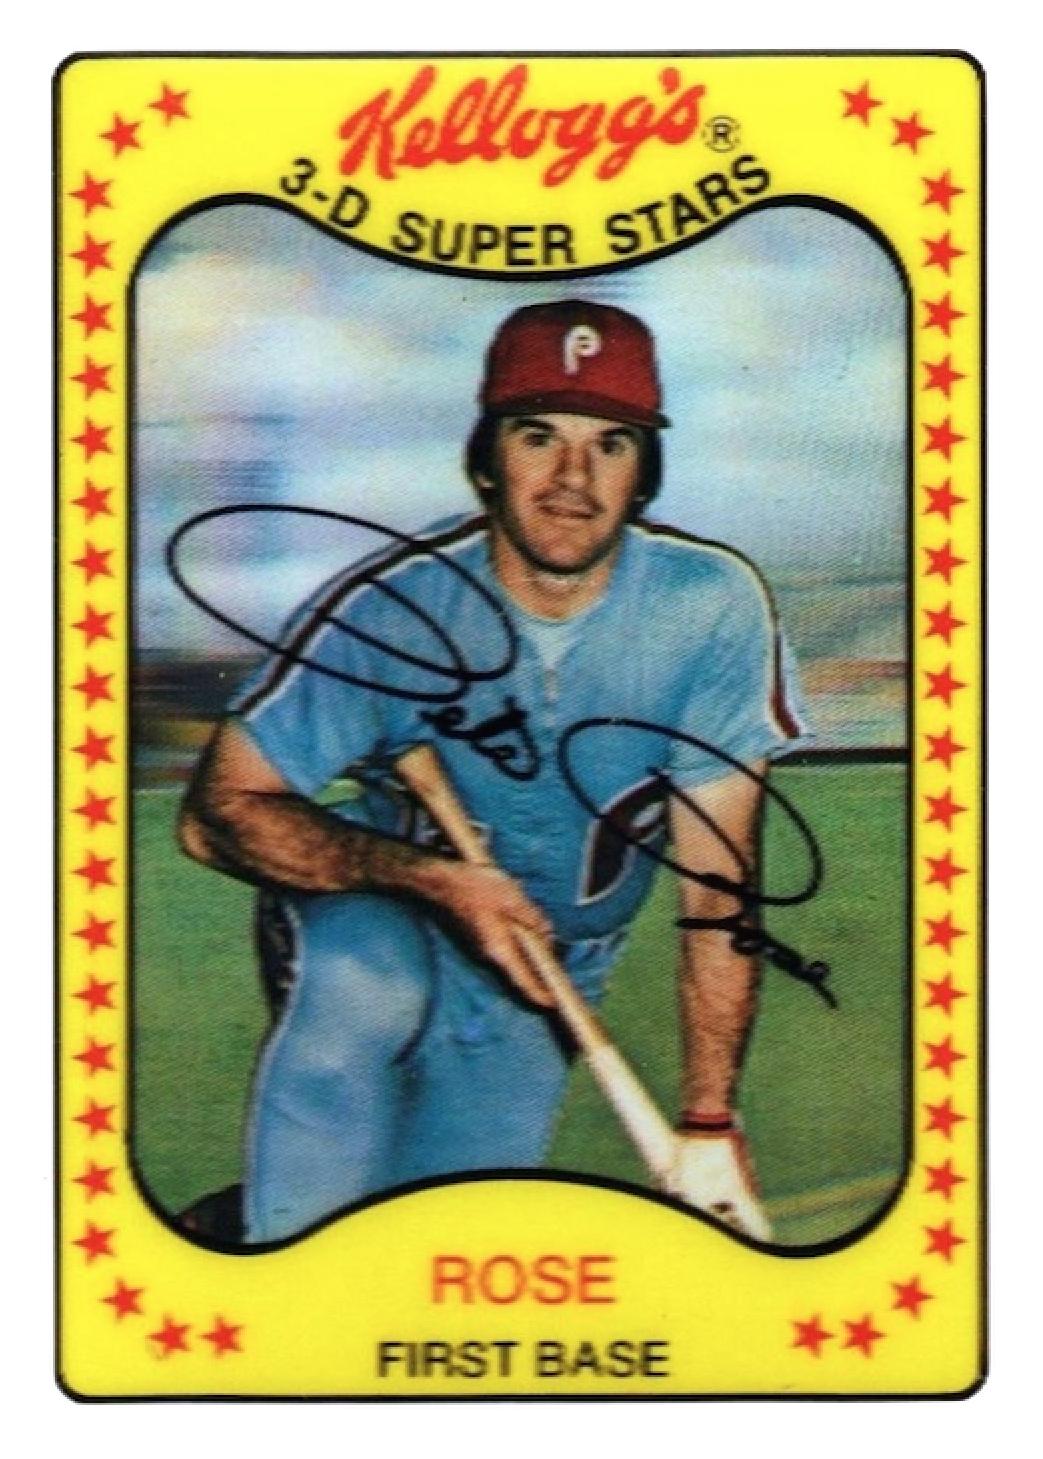 Pete Rose 1981 Kelloggs Philadelphia Phillies Strictly